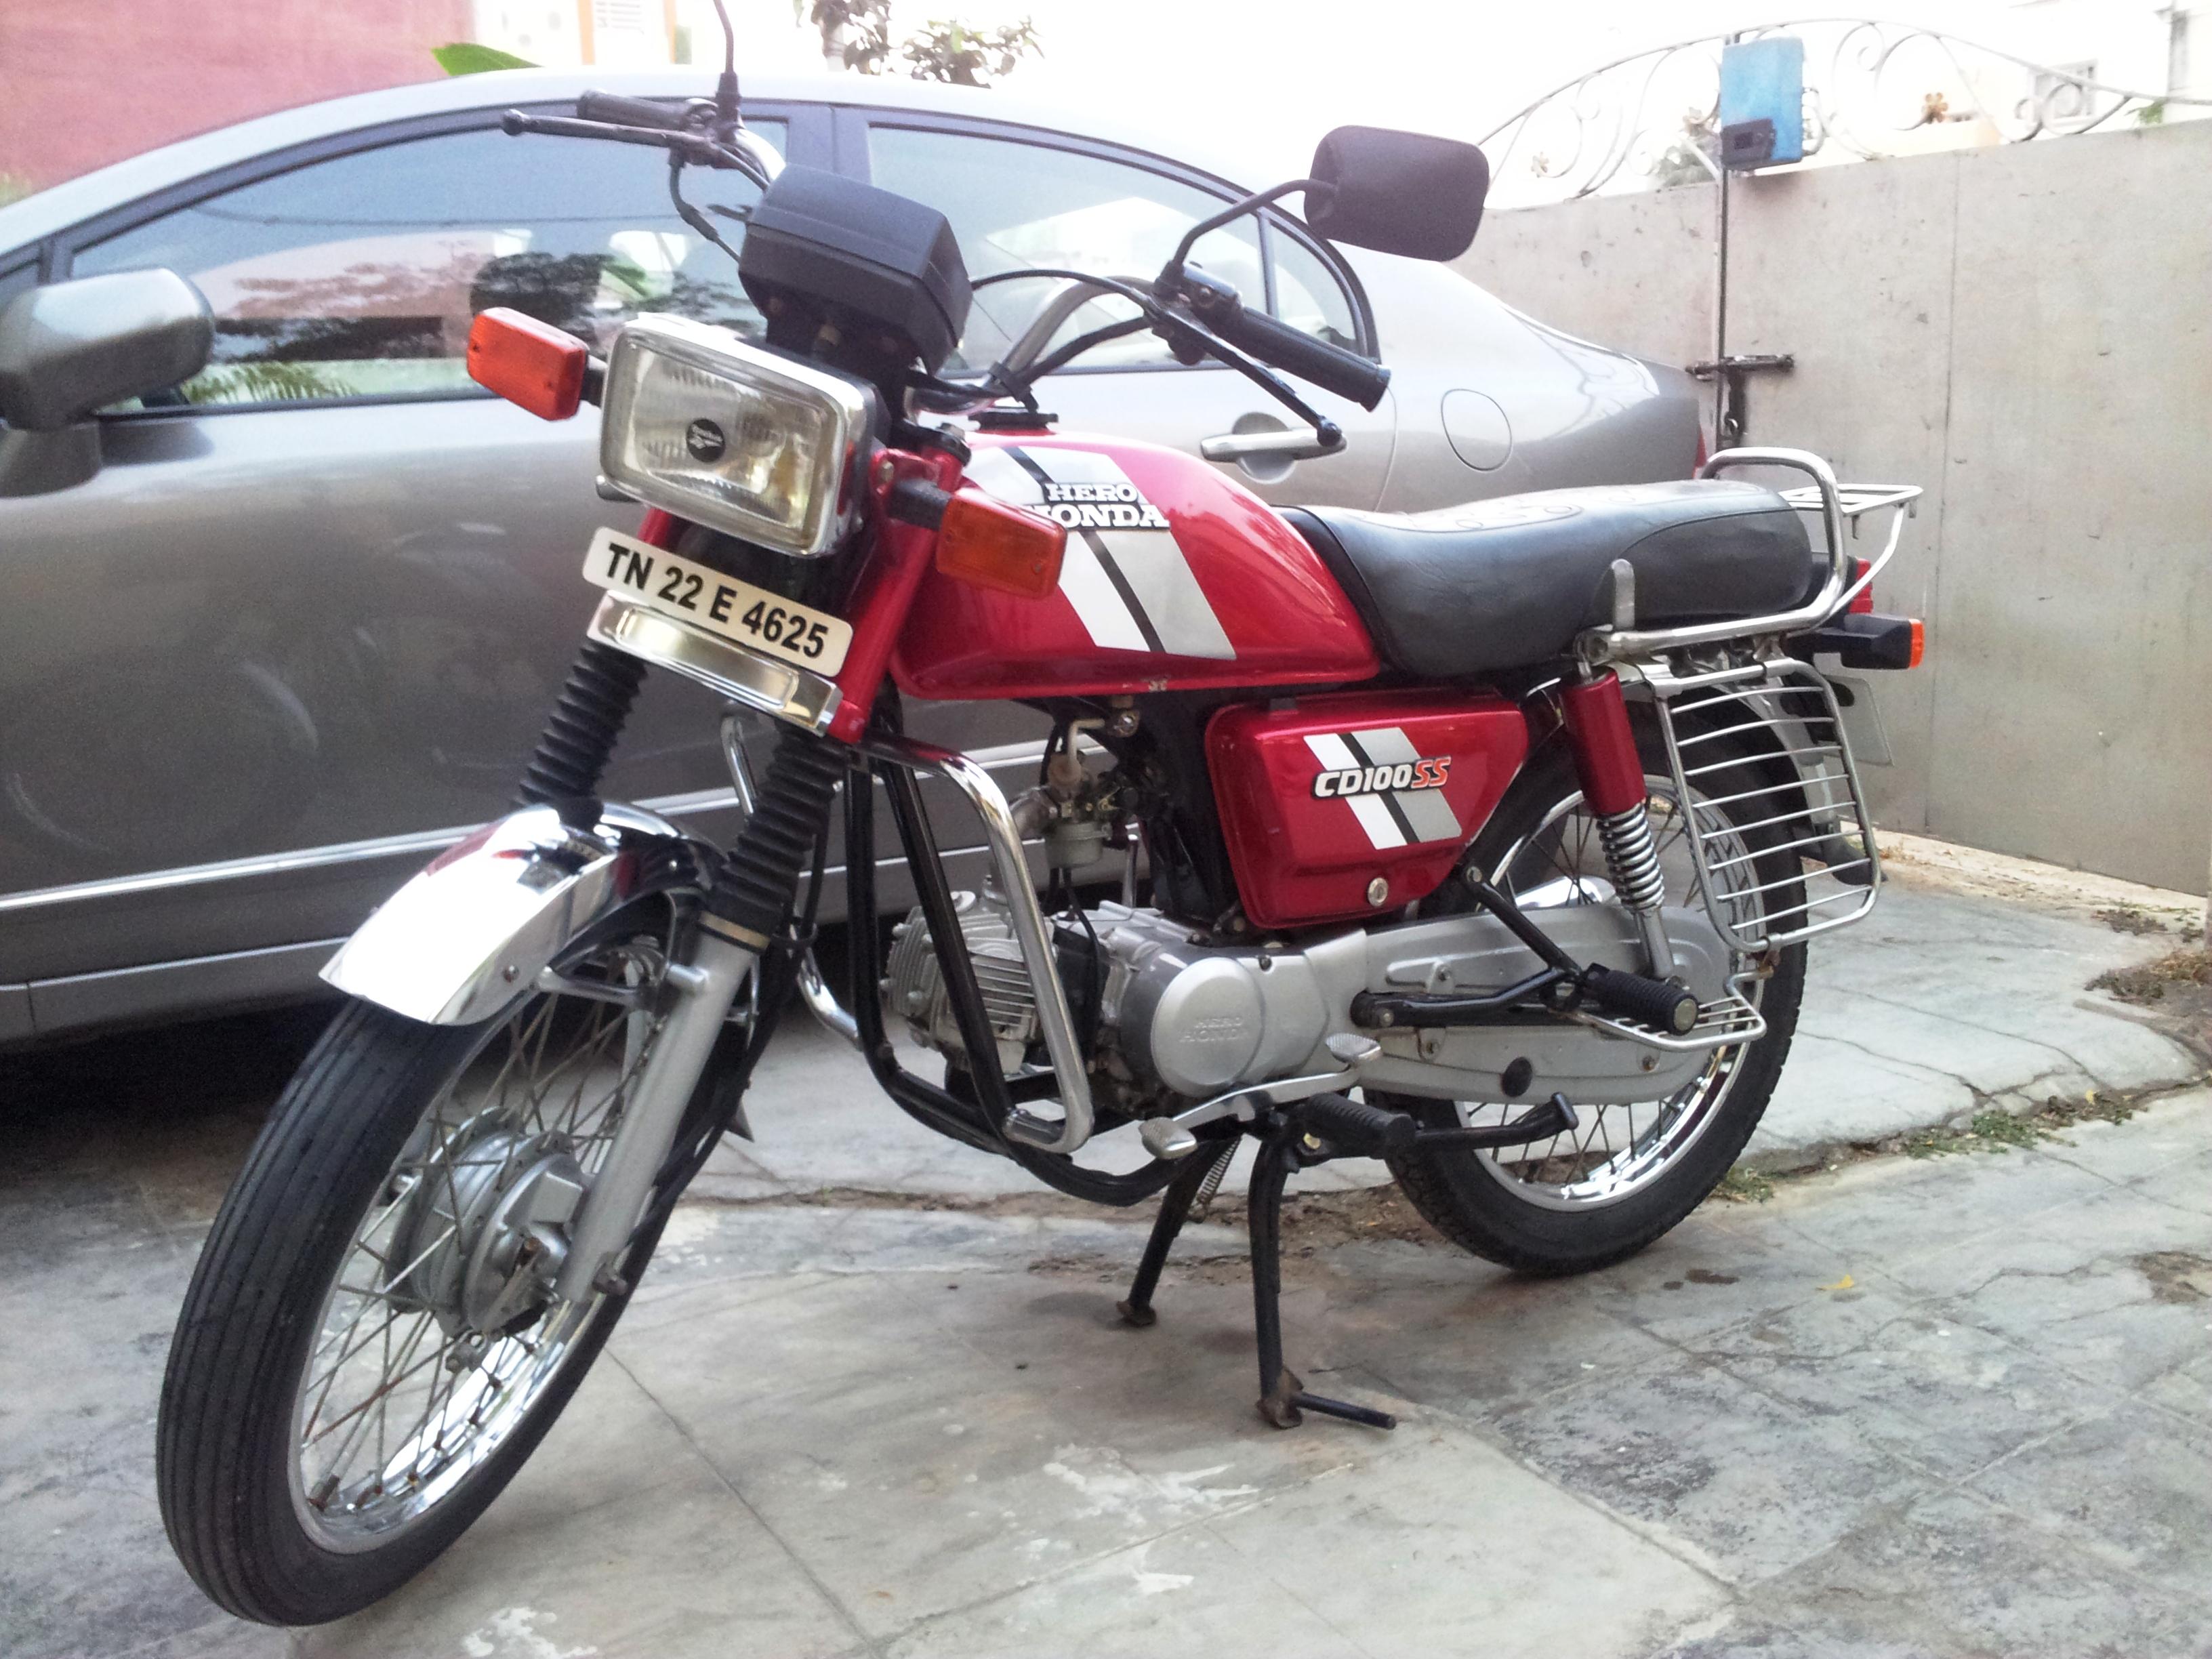 a0251d24a01 Awesome bike - HERO HONDA CD 100 SS Customer Review - MouthShut.com